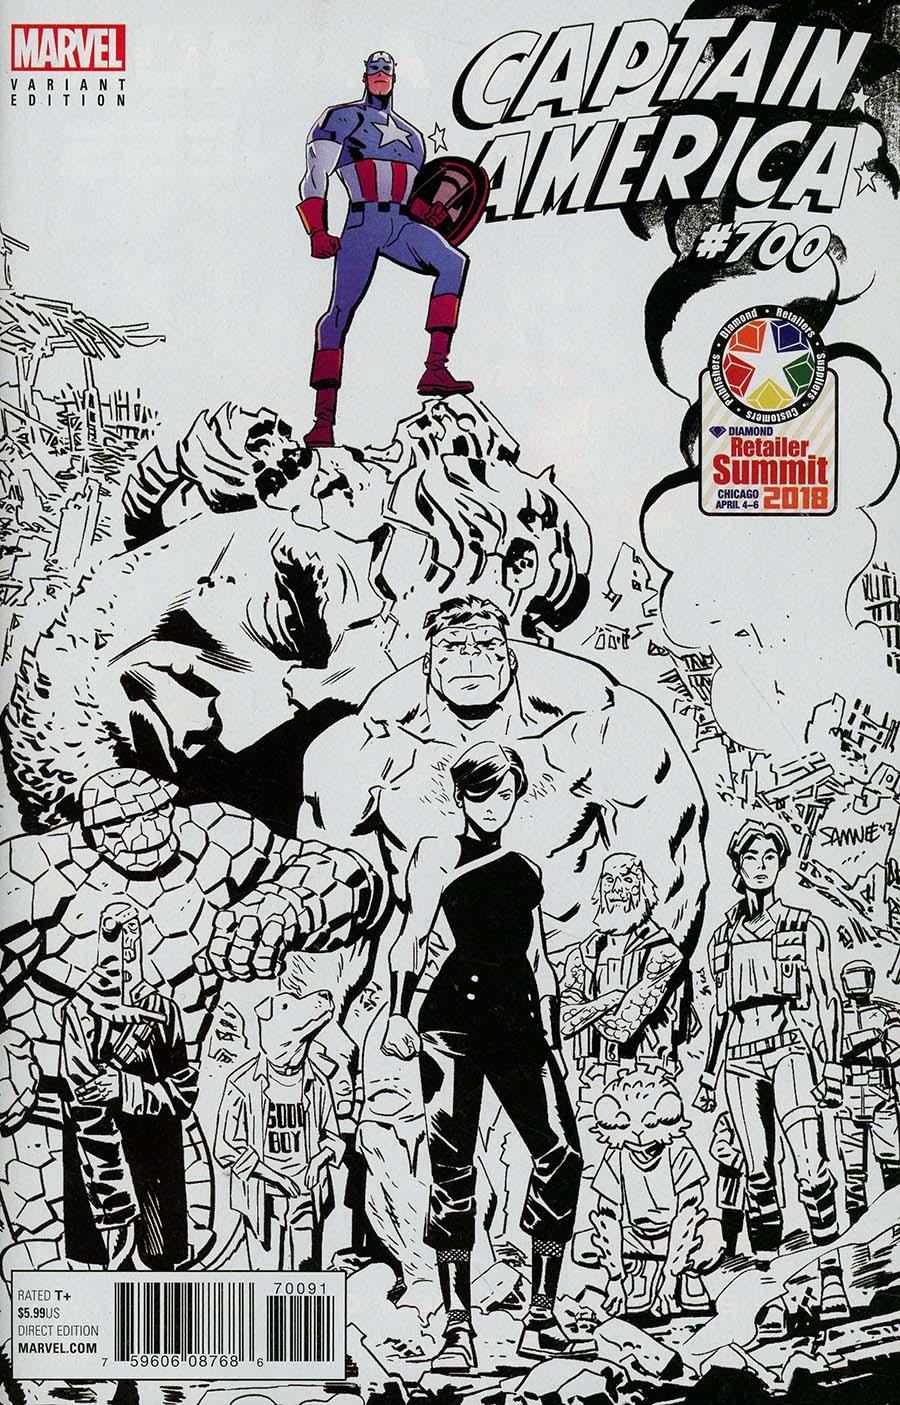 Captain America Vol 8 #700 Cover E Variant Retailer Summit 2018 Chris Samnee Cover